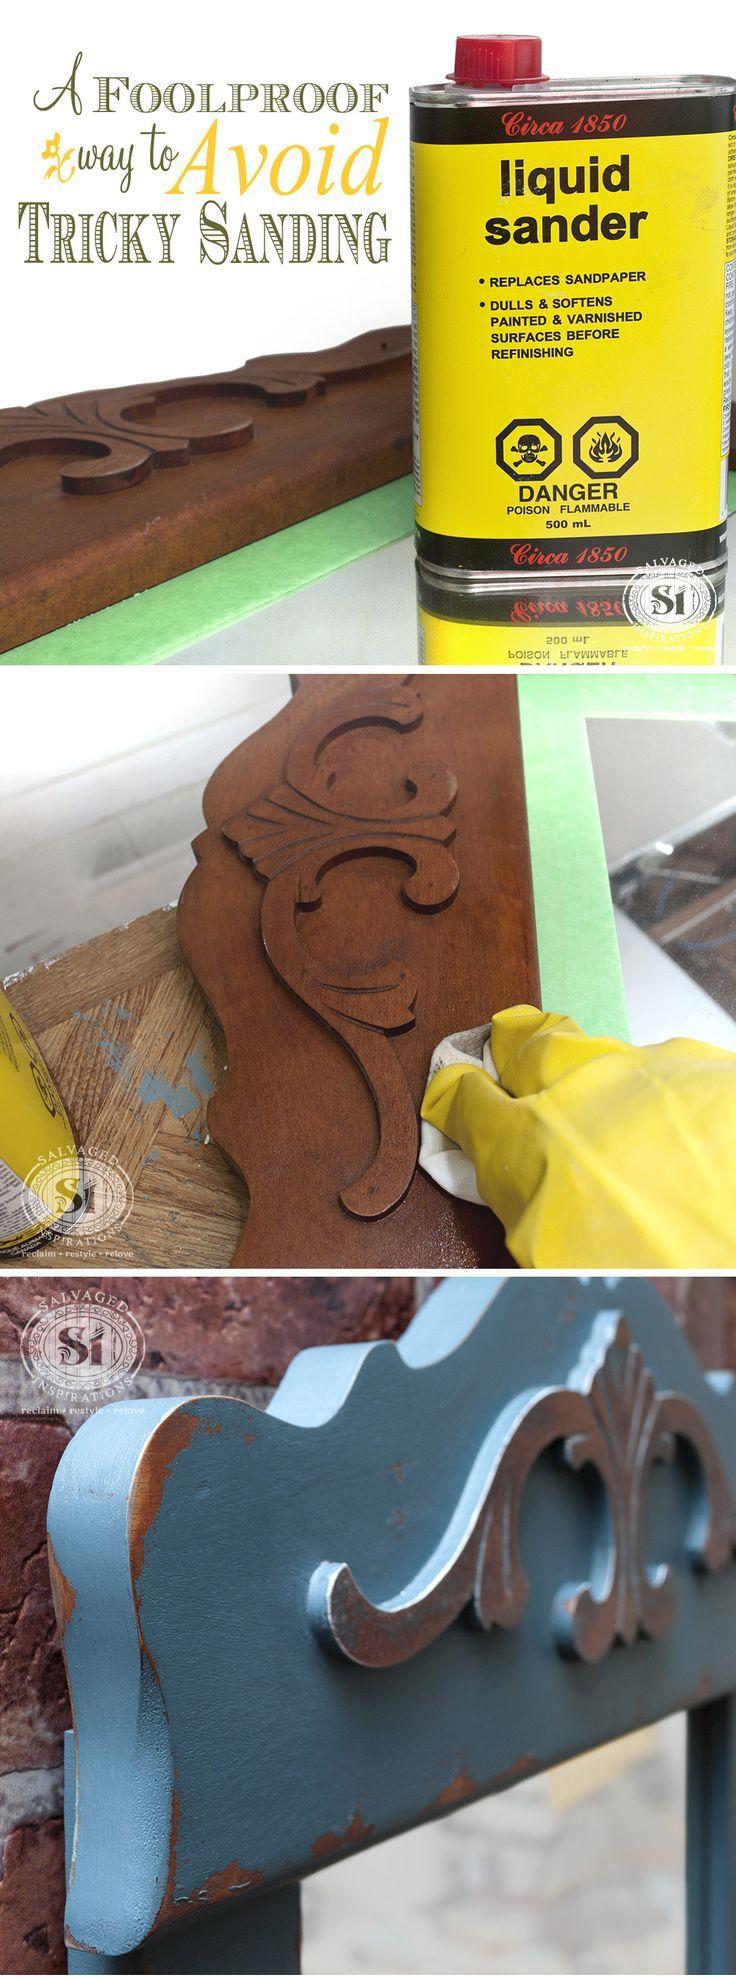 Furniture painting ideas techniques - Furniture Painting Ideas Techniques 29